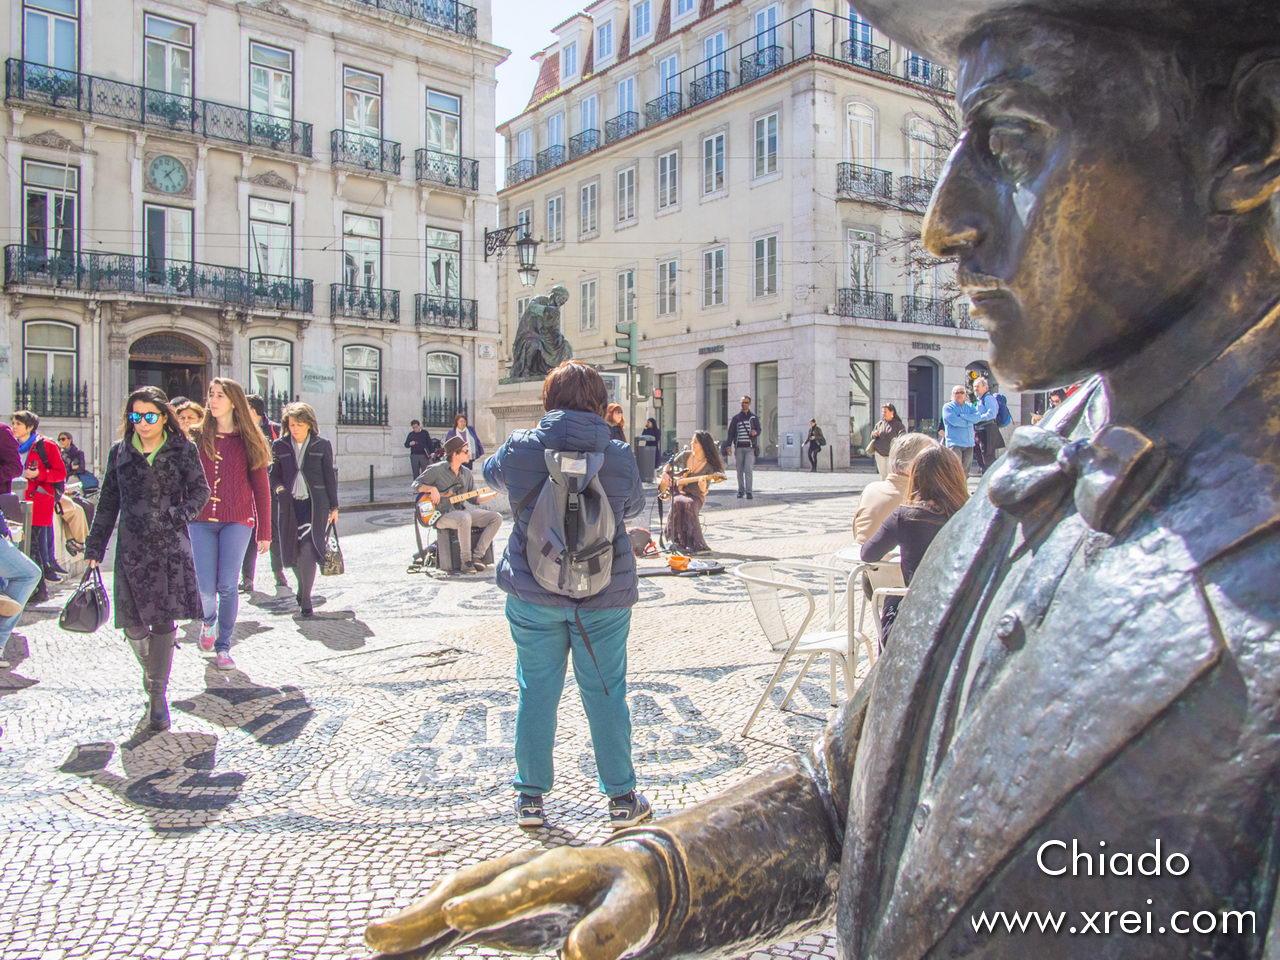 Statue of Fernando Pessoa, in Chiado